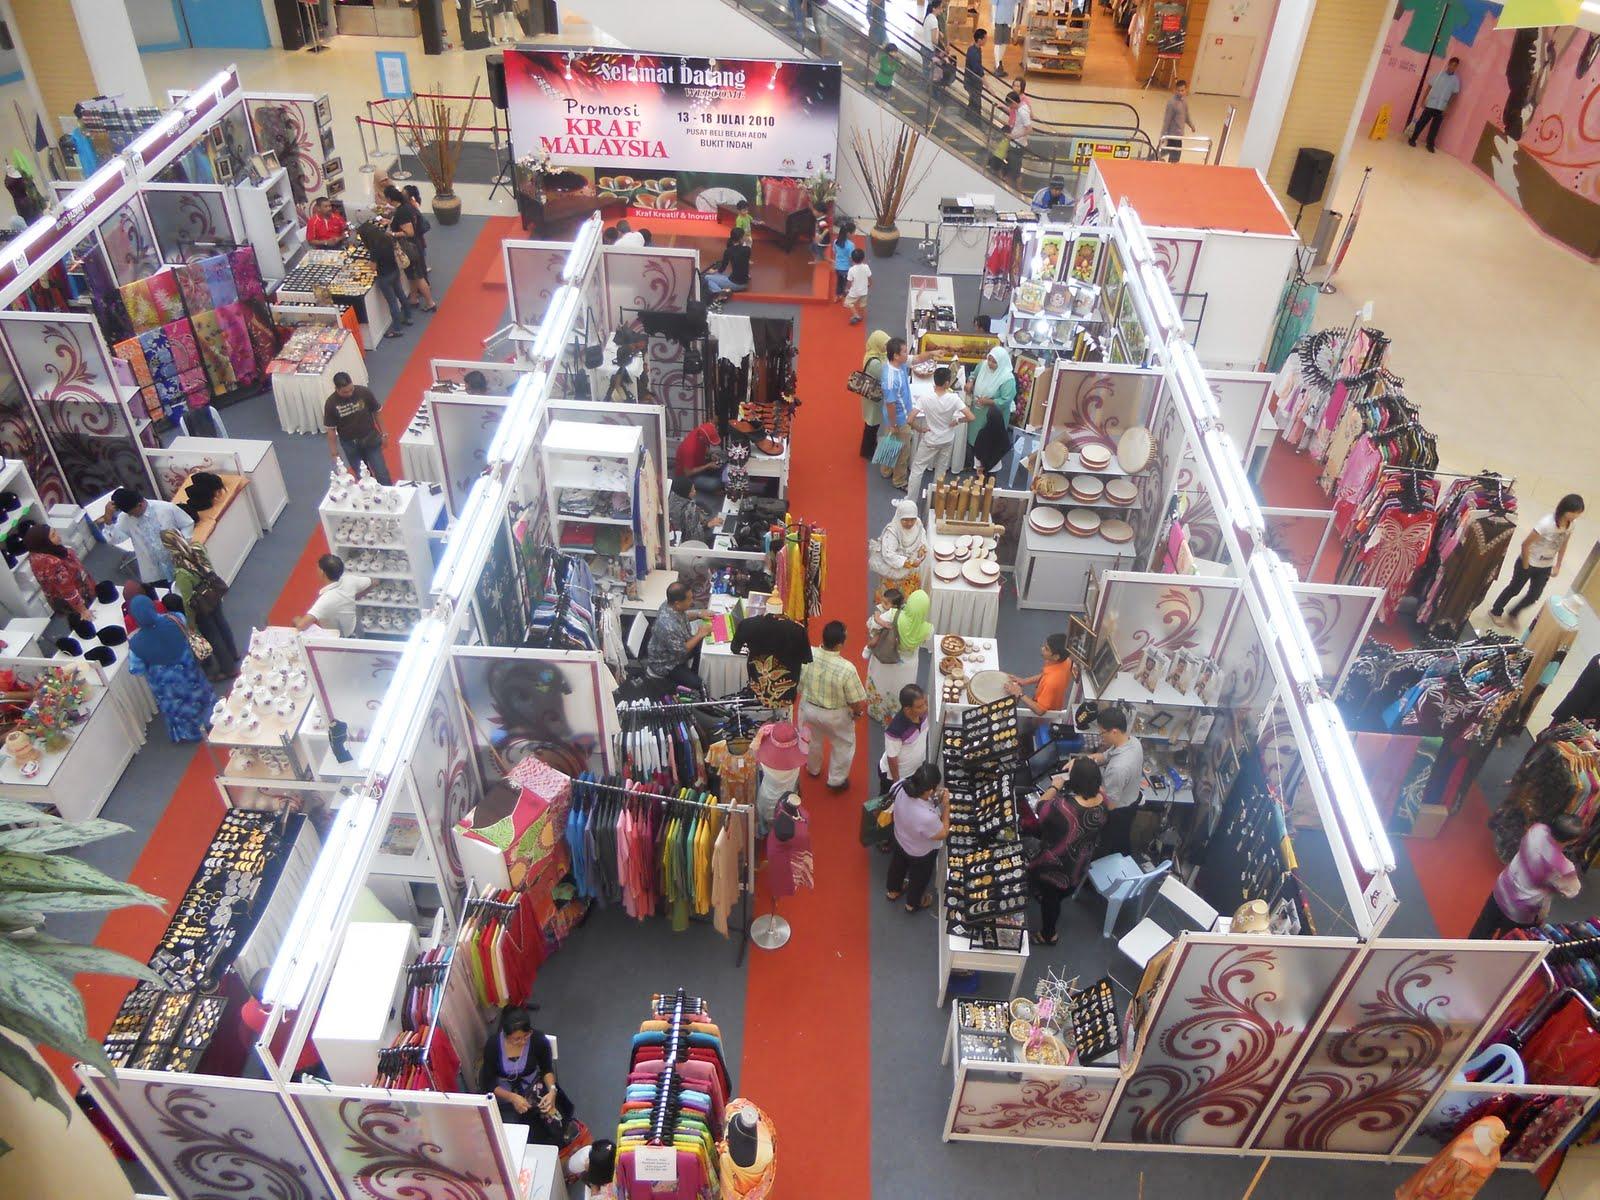 Promosi Kraf Malaysia Di Pusat Membeli-Belah (AEON Jusco Bukit Indah)